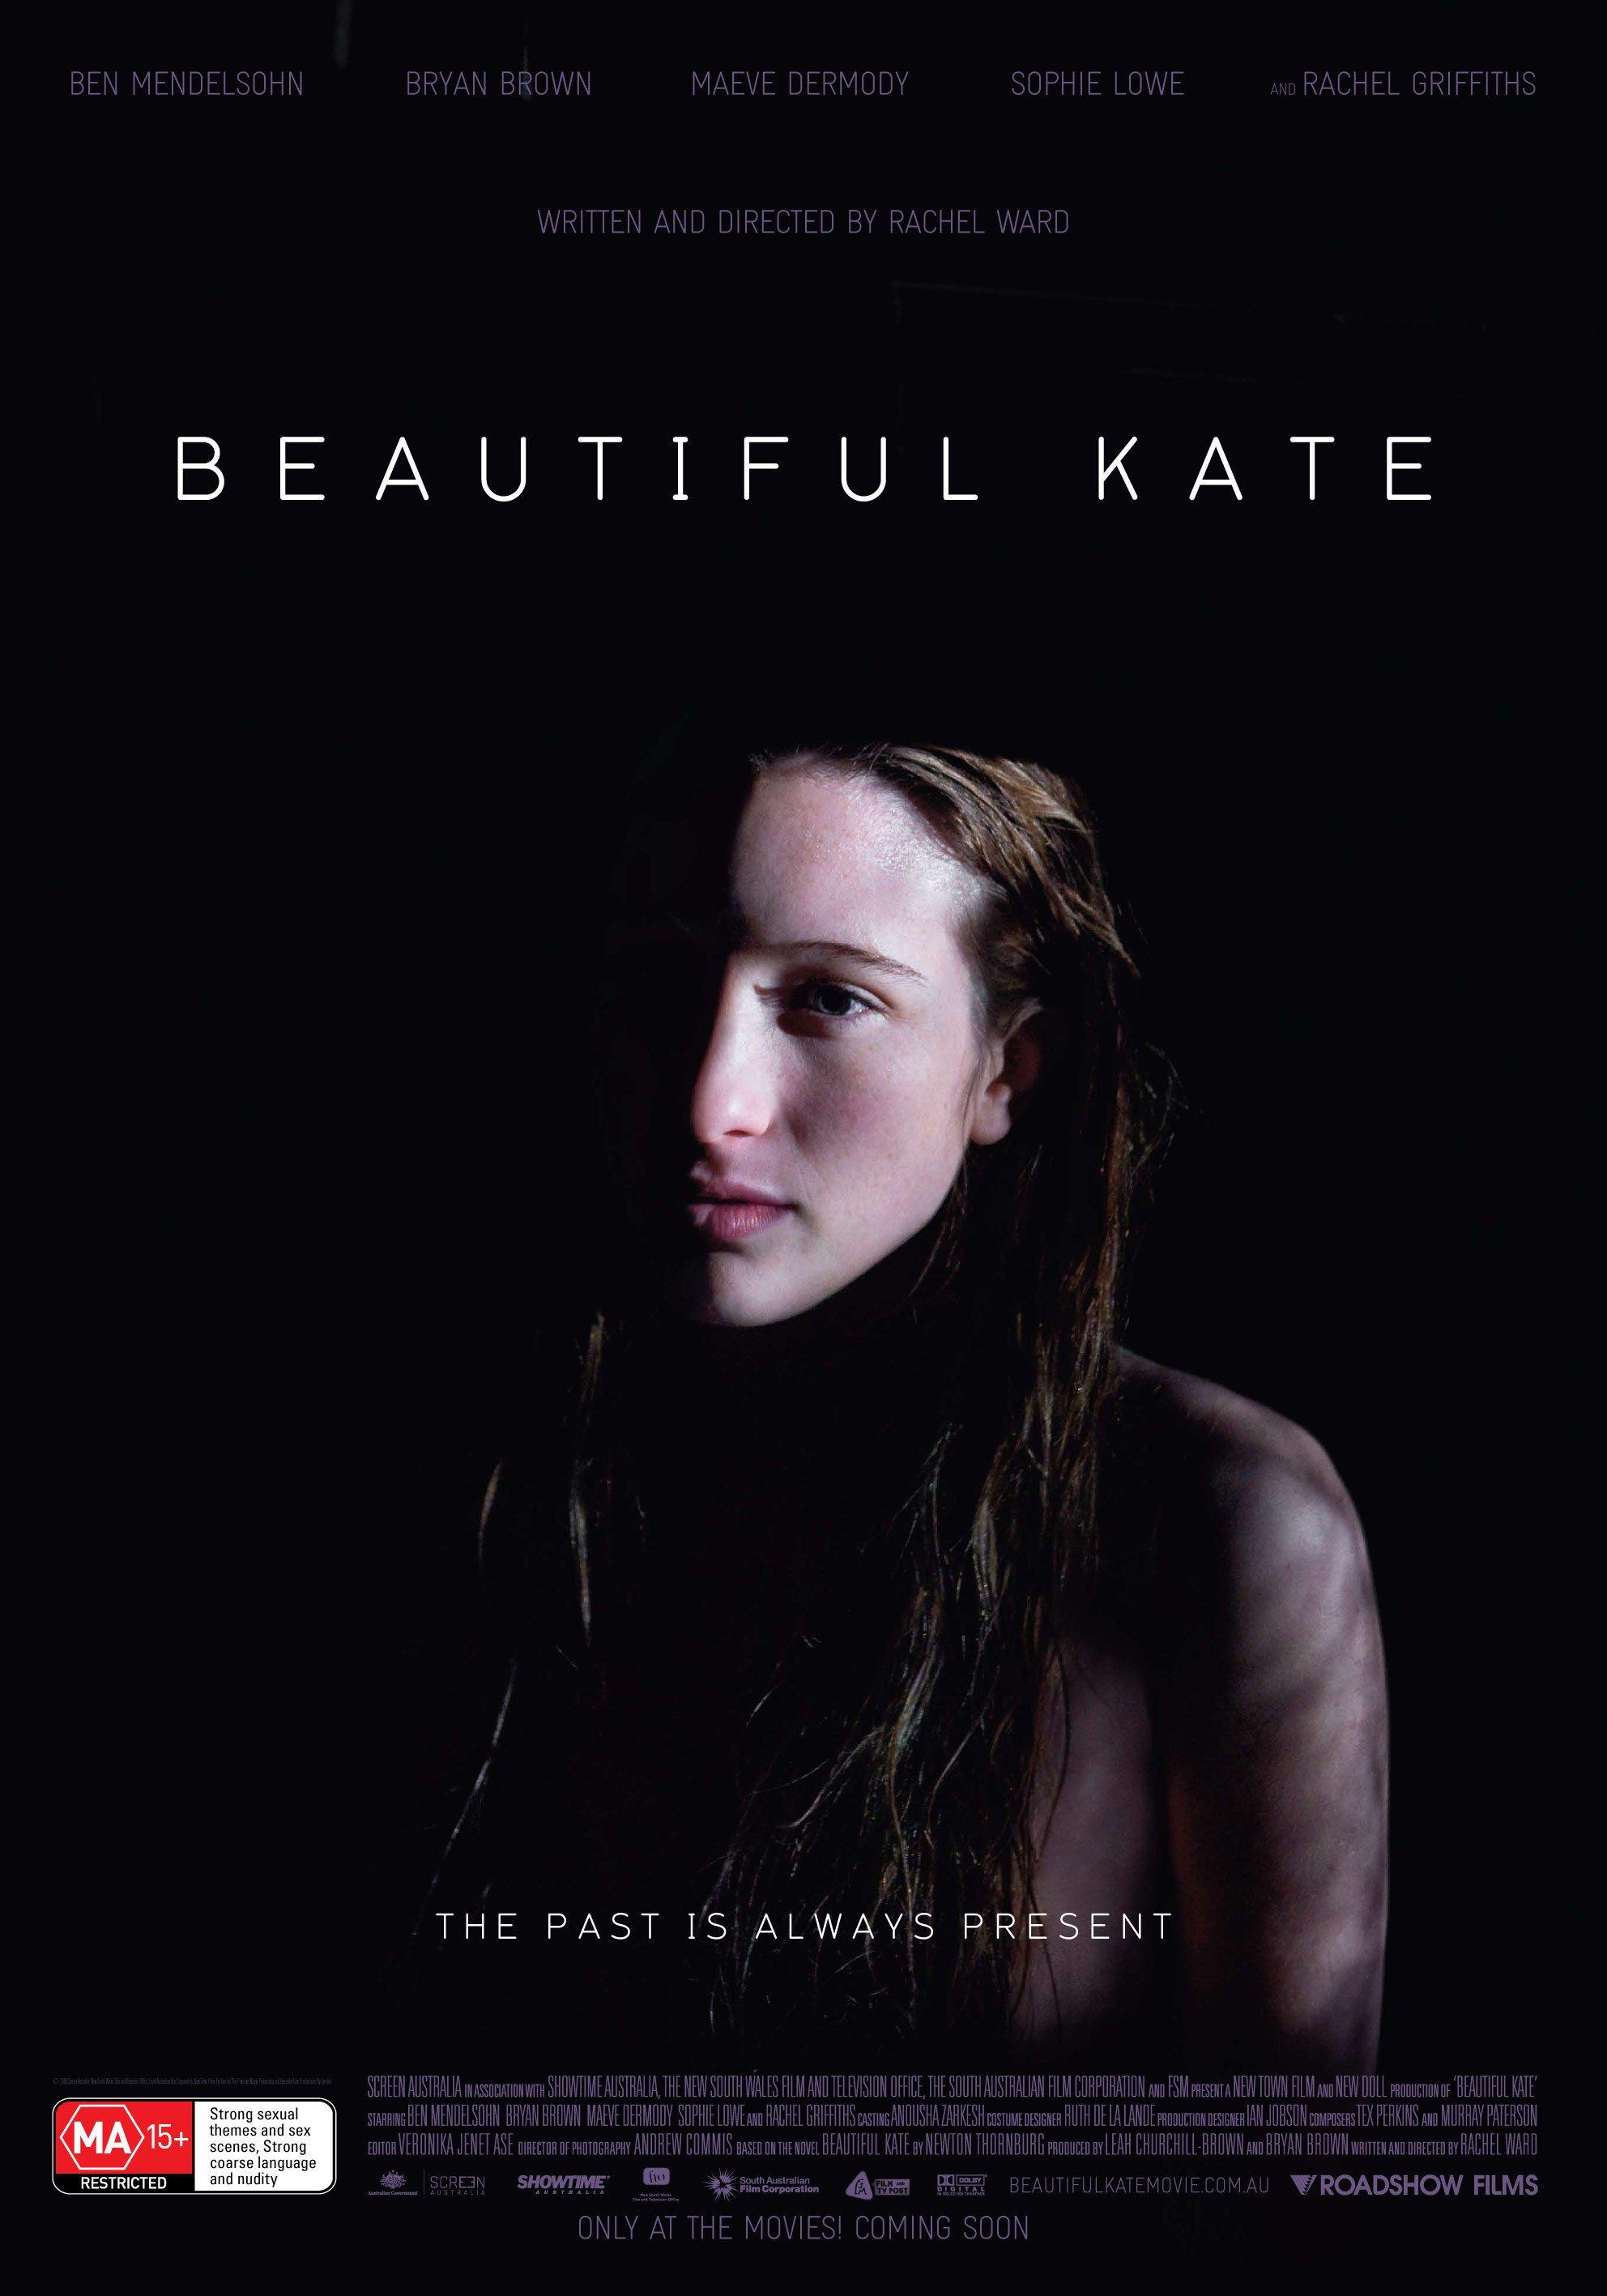 beautiful-kate-2009-picture-1.jpg